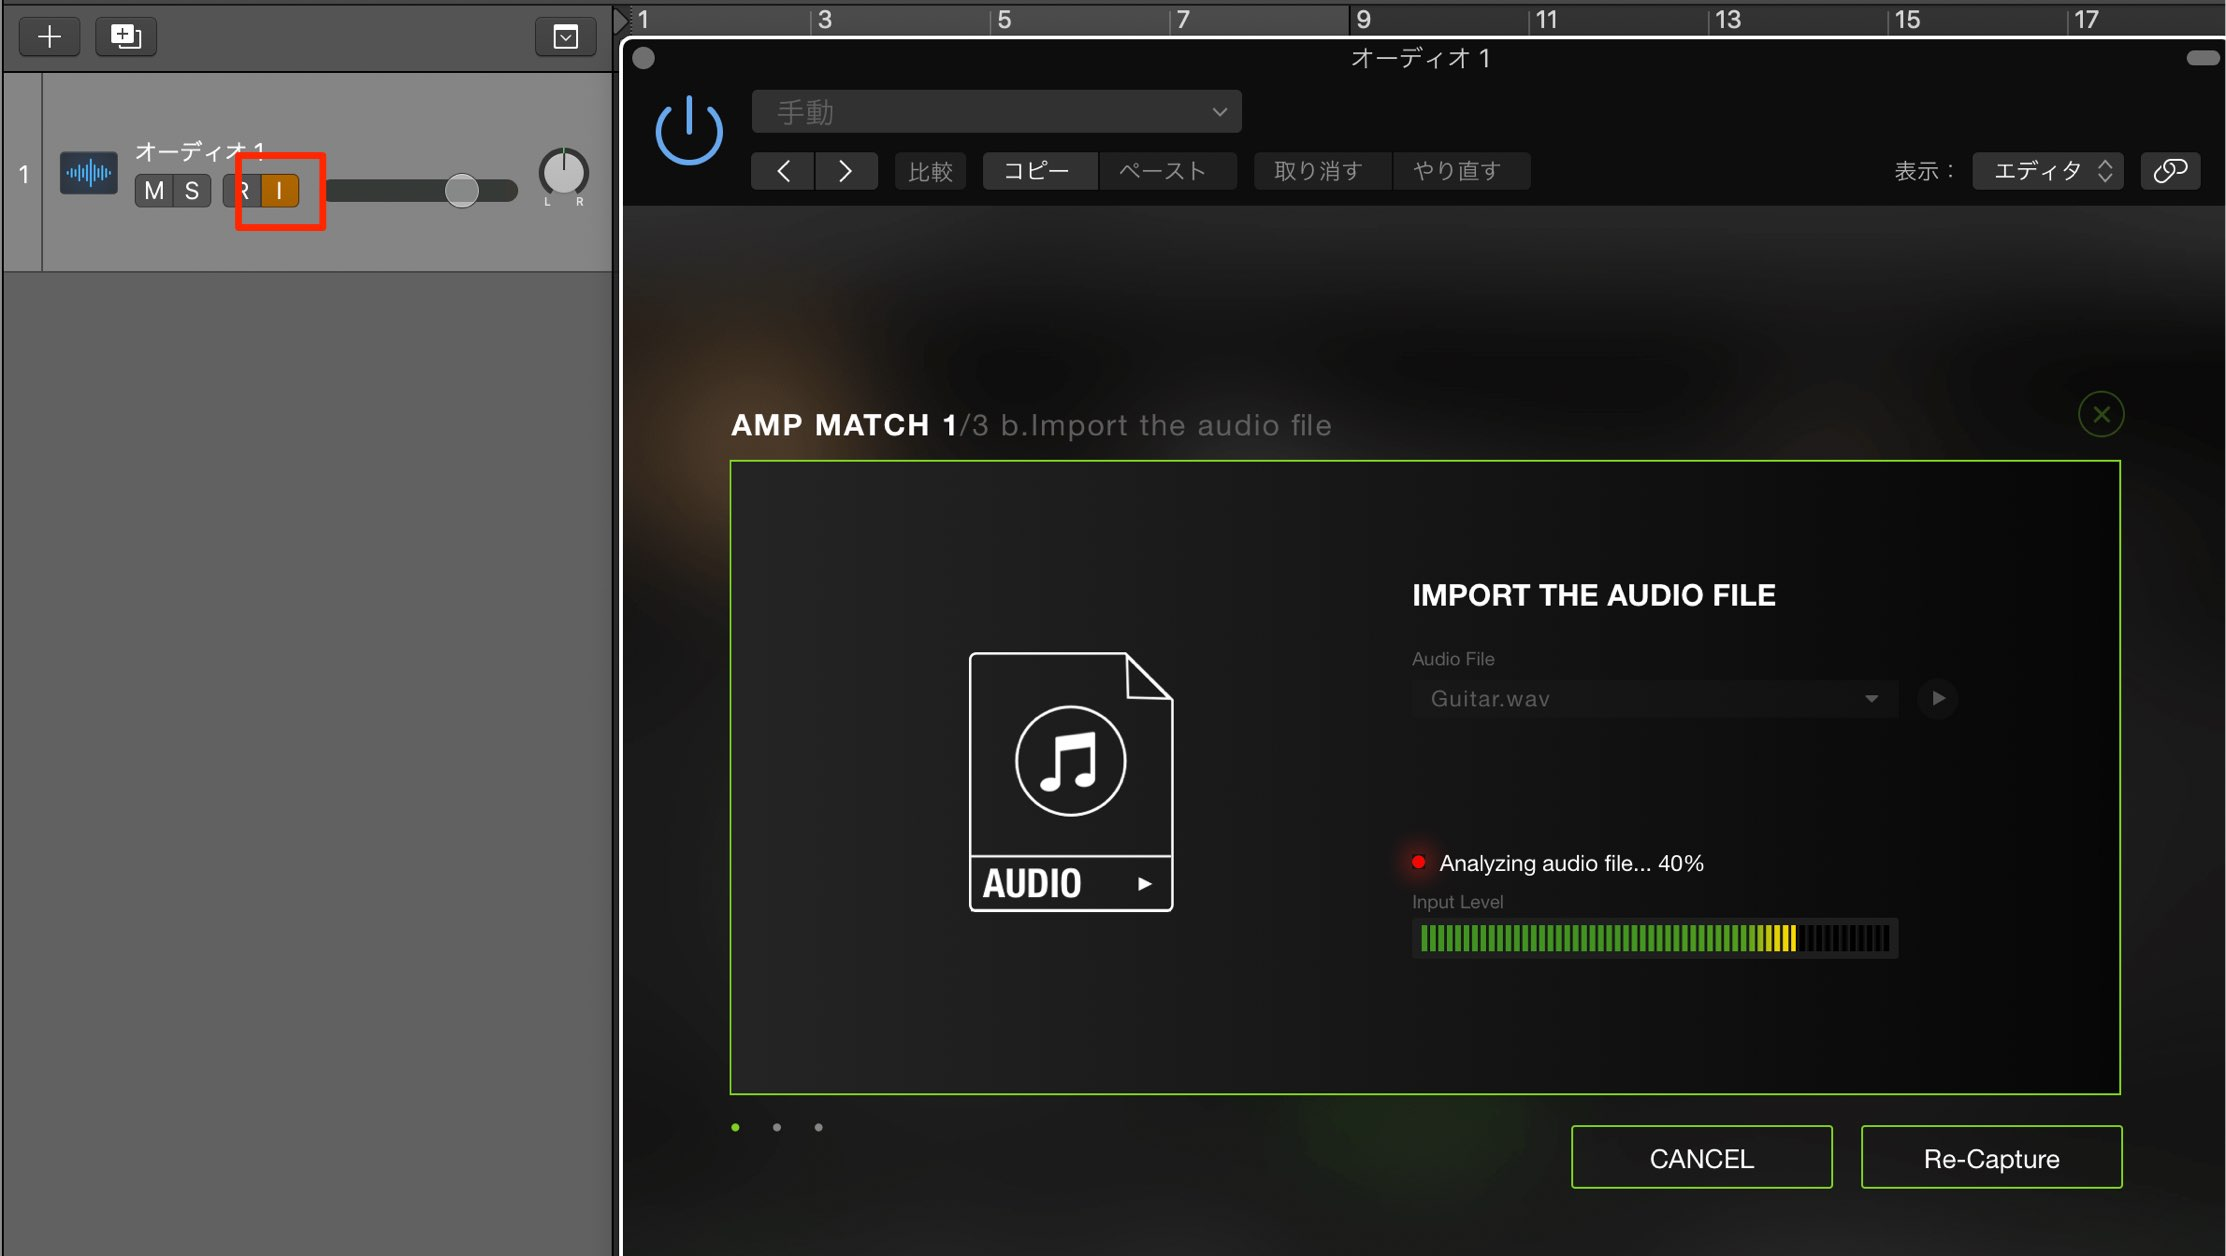 AMP MATCH-1